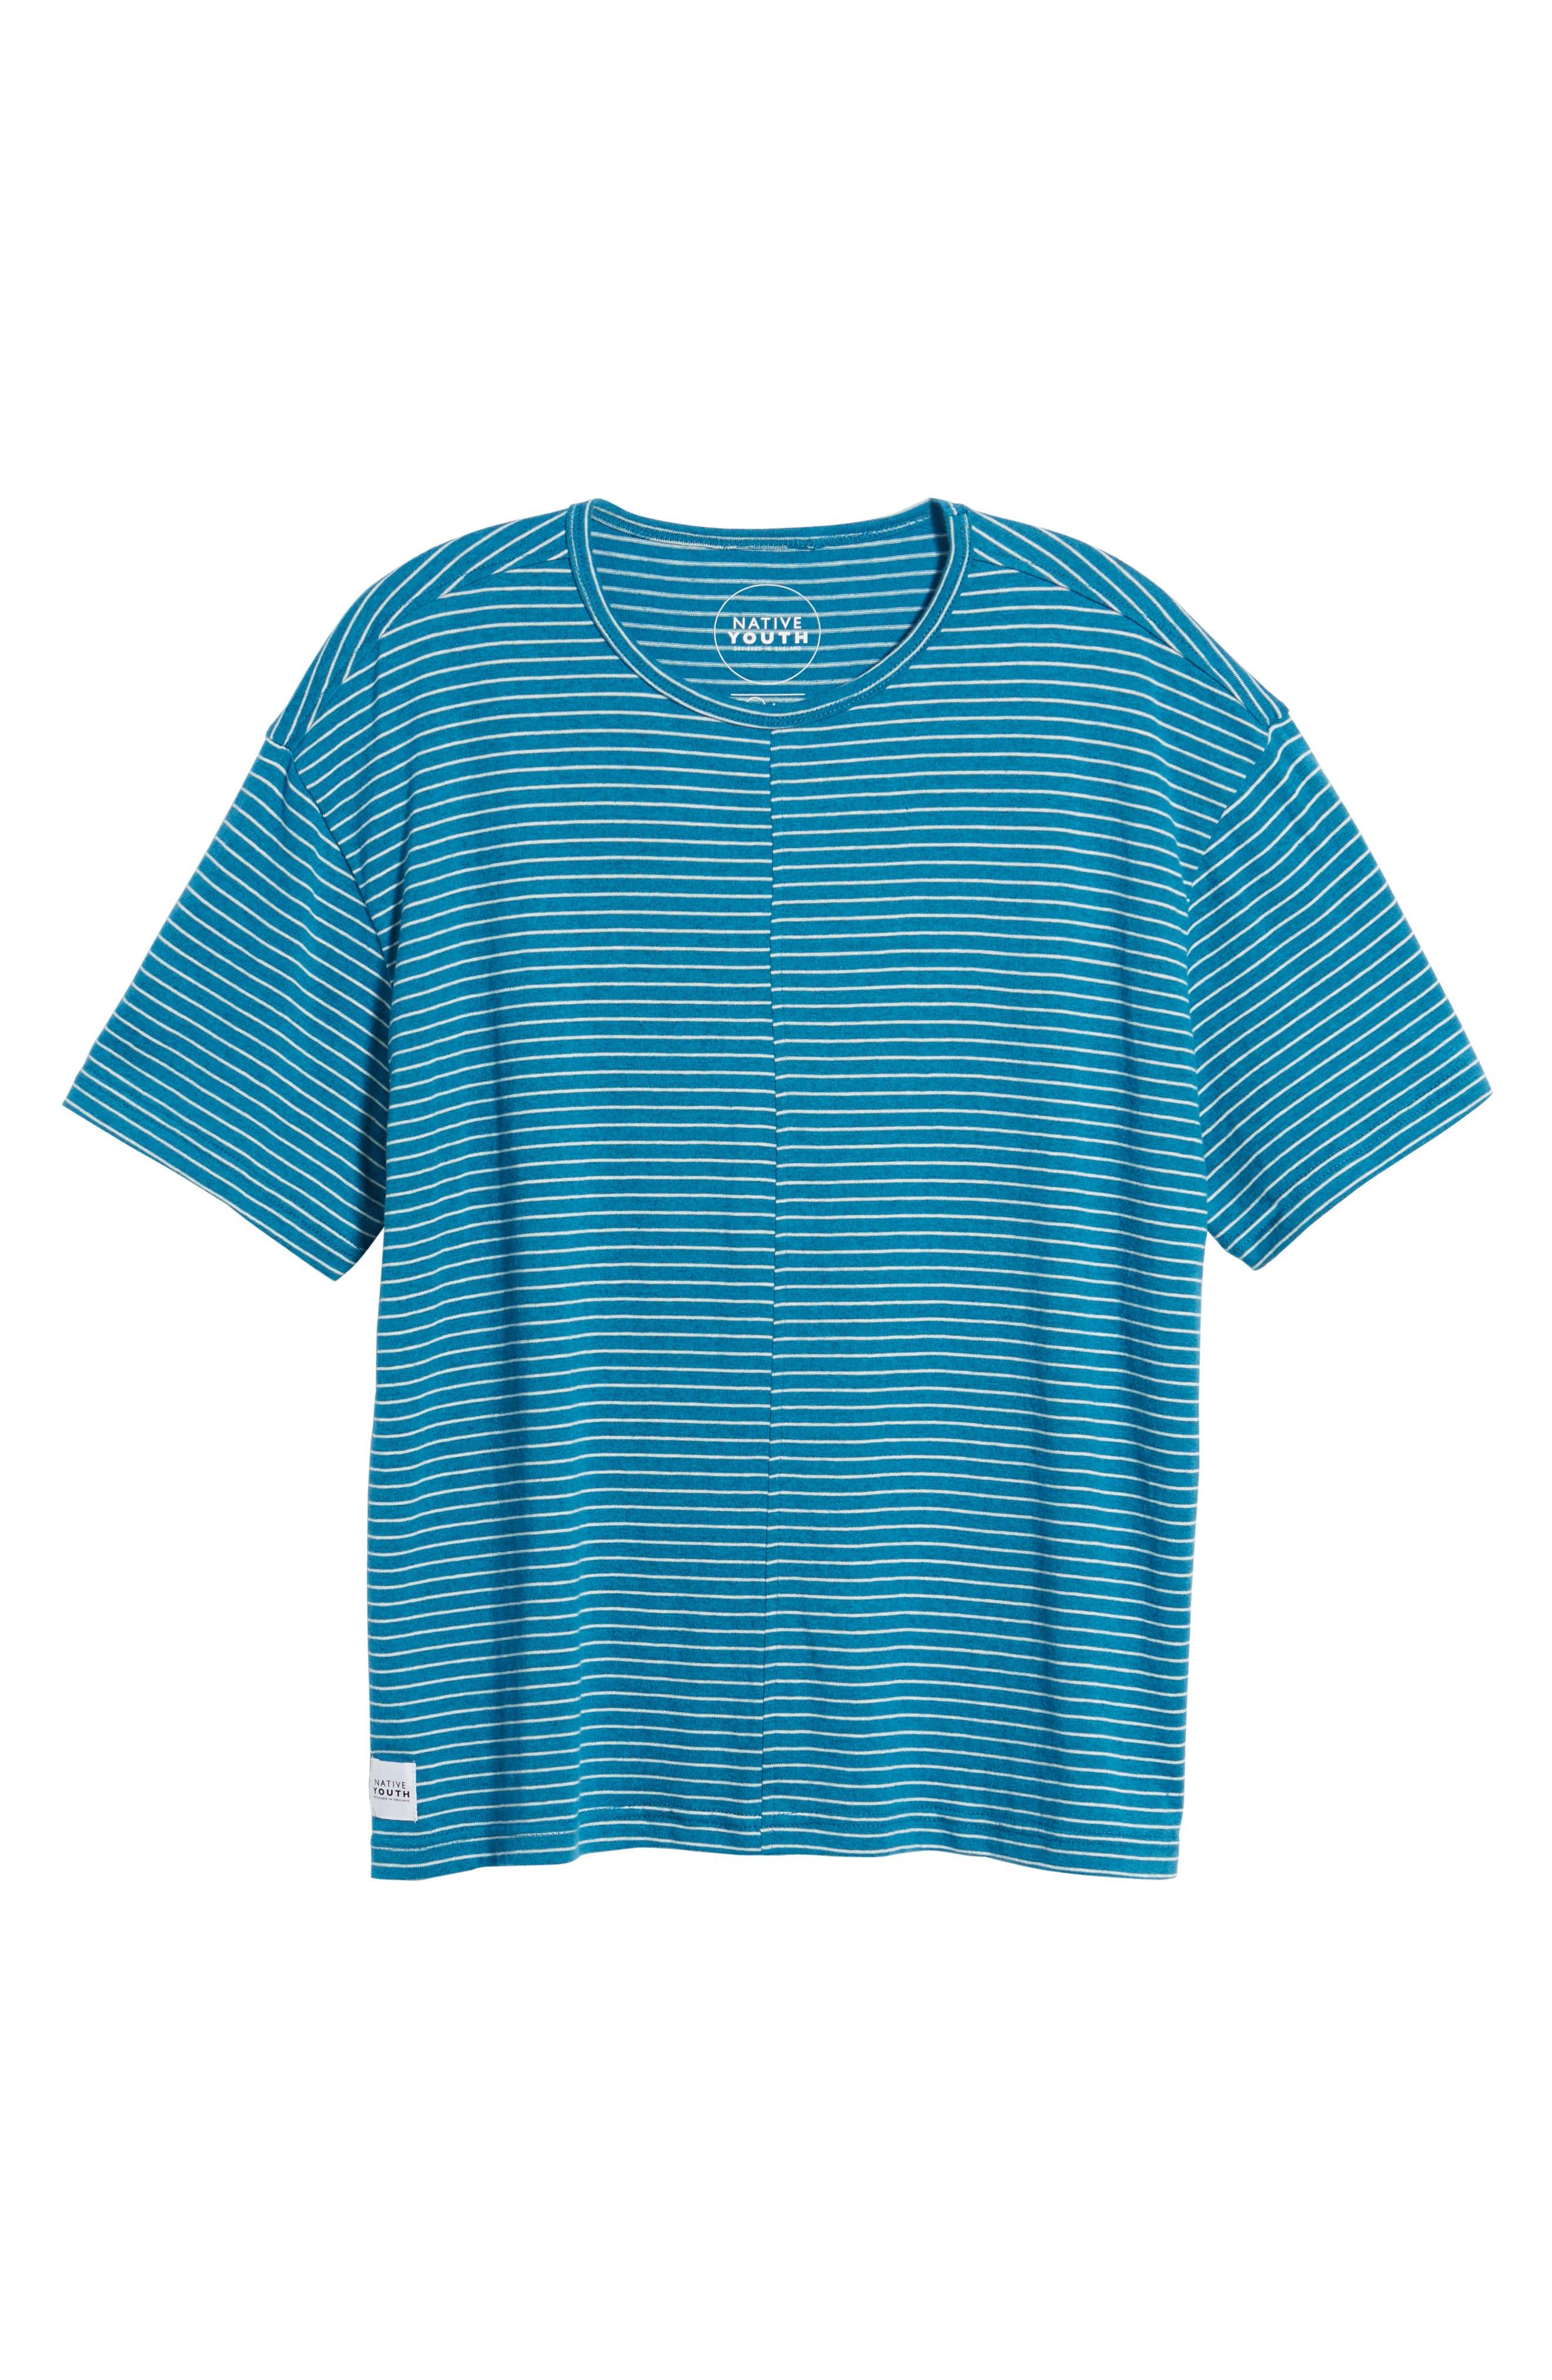 Boost T-Shirt,                             Alternate thumbnail 6, color,                             400